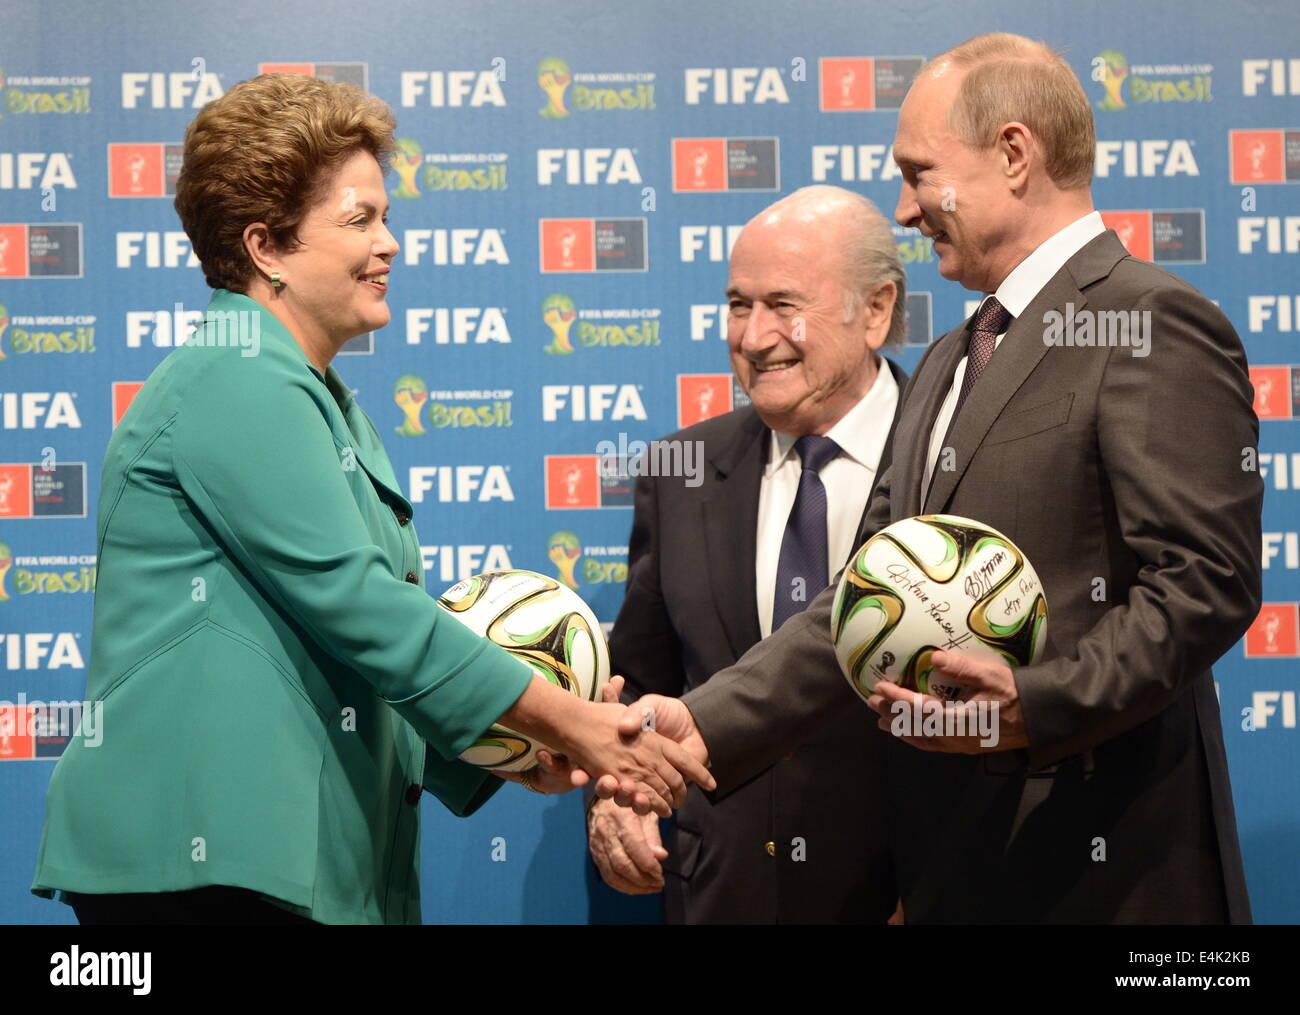 Rio De Janeiro, Brazil. 13th July, 2014. Brazilian President Dilma Rousseff, FIFA President Joseph Blatter, and - Stock Image